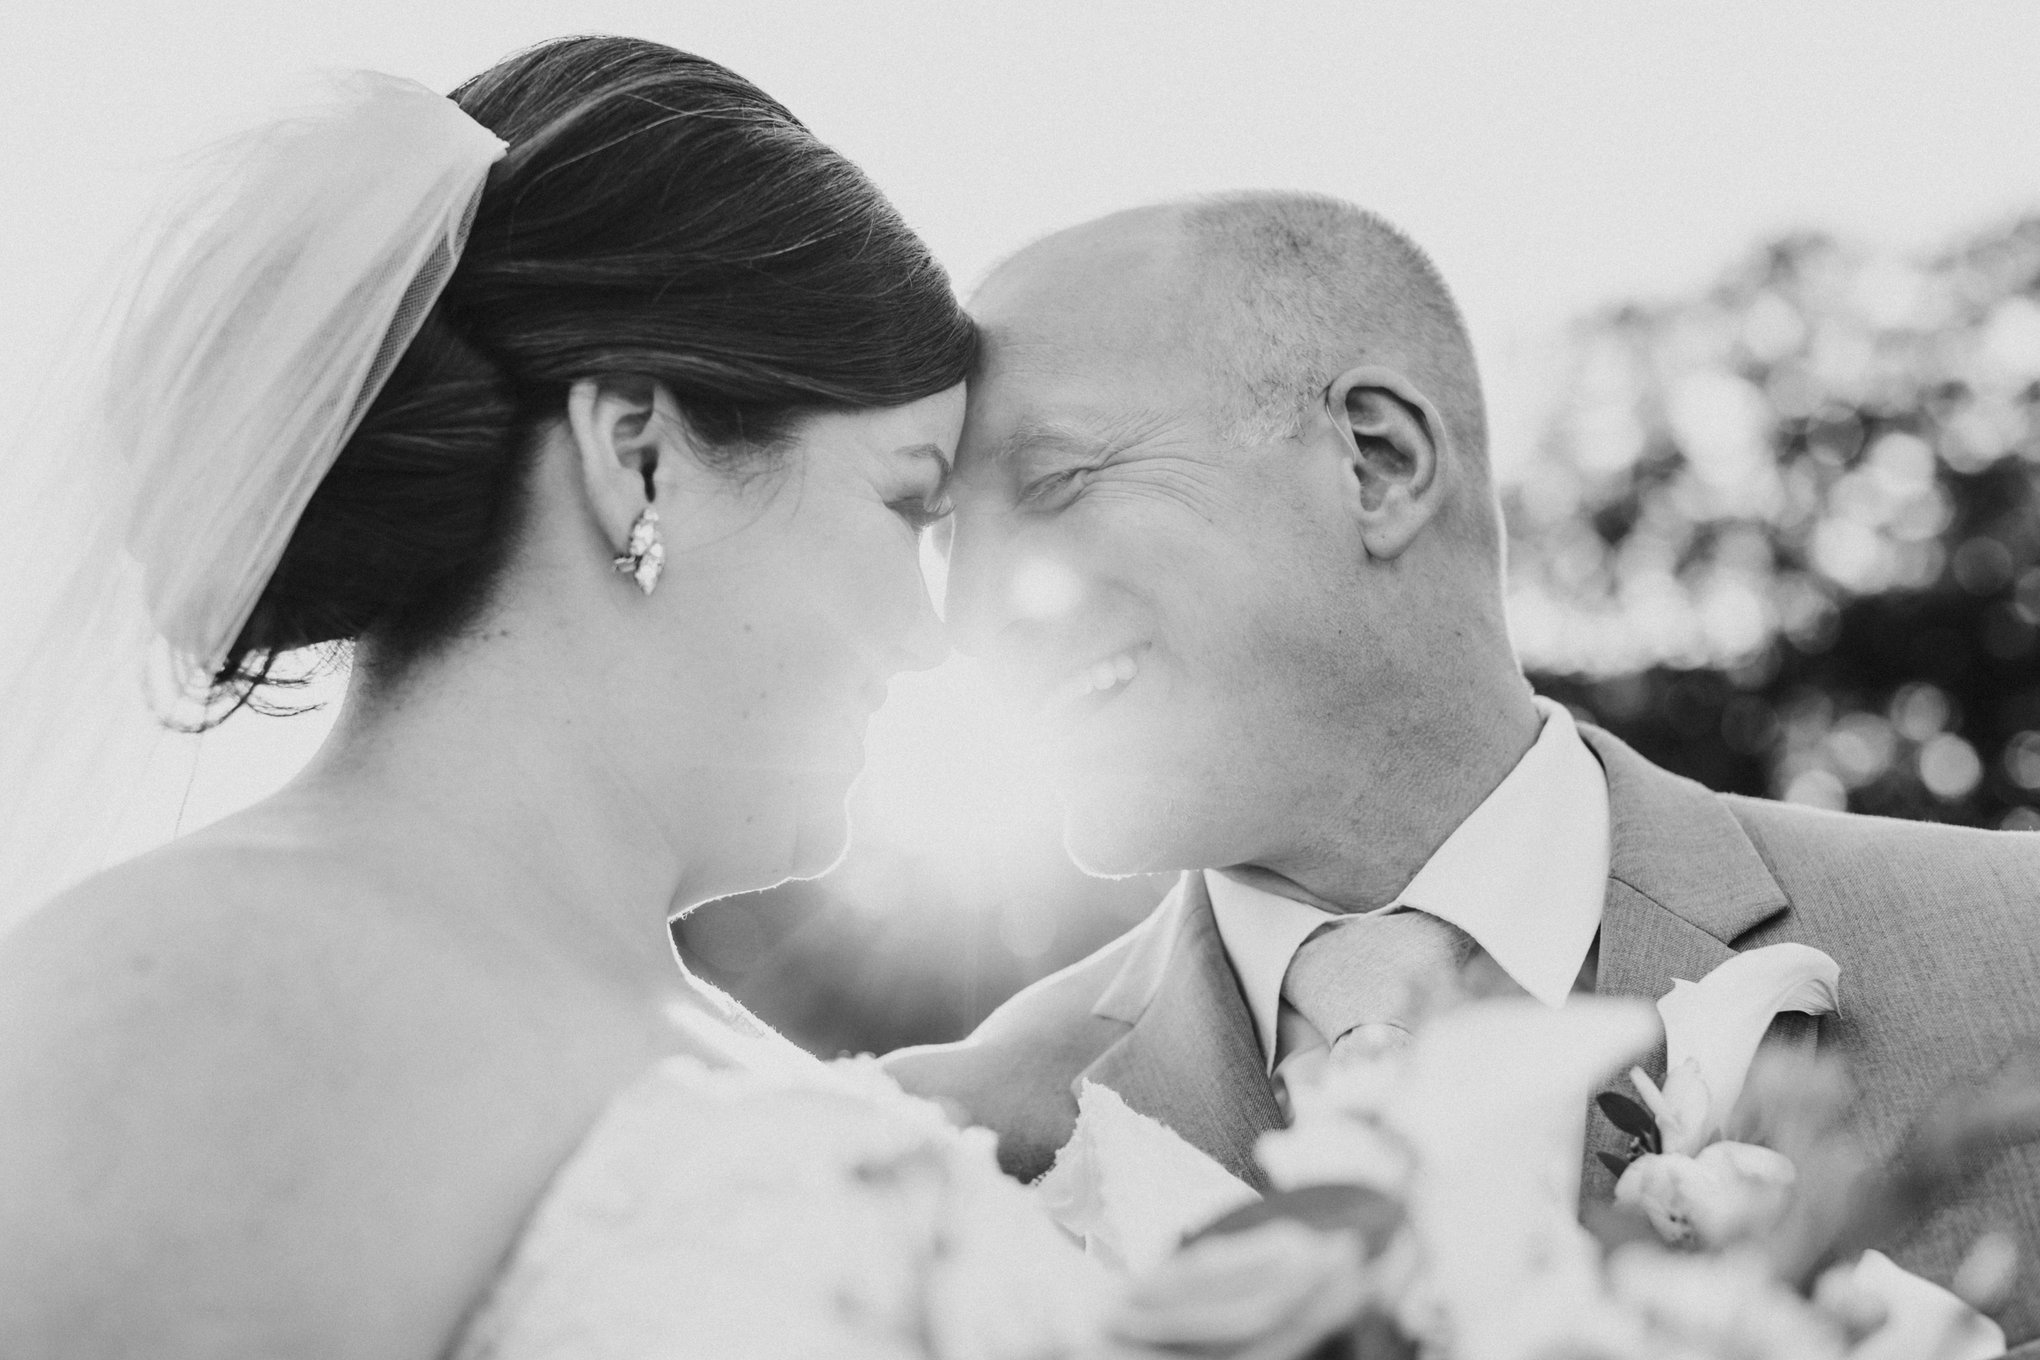 Lena_Mirisola_2017_Weddings_-030.jpg